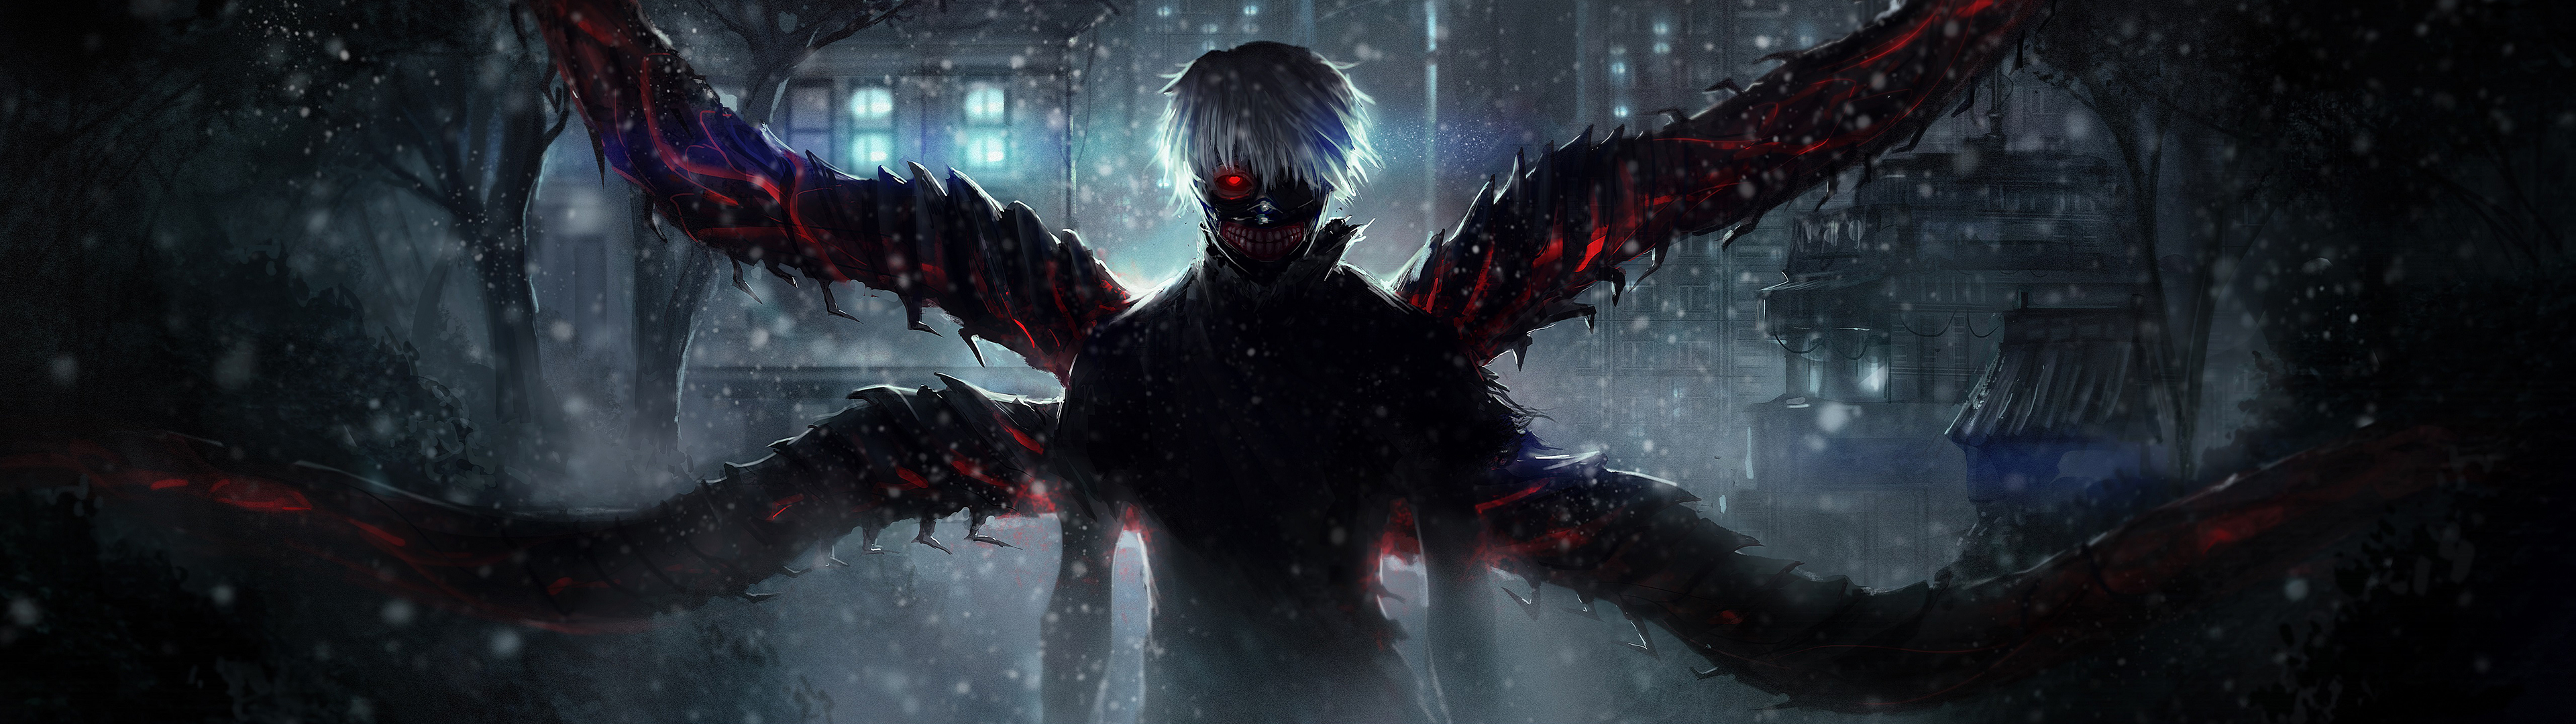 Dual Monitor Anime - Tokyo Ghoul Hd Wallper - 3840x1080 ...